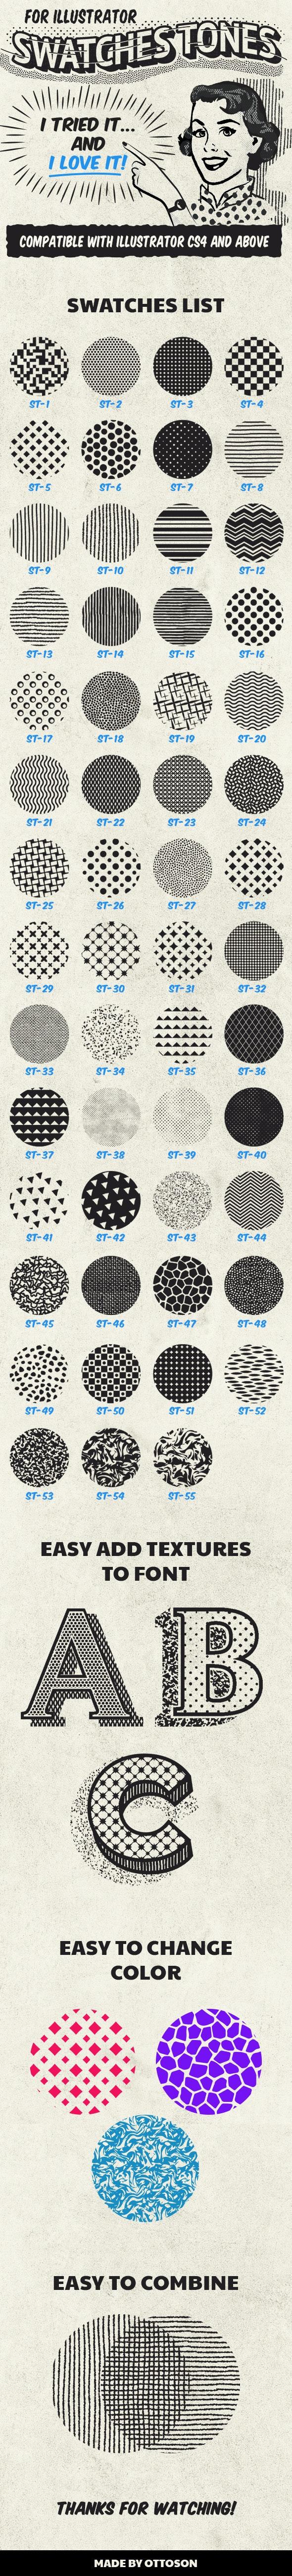 Swatches Tones - Textures / Fills / Patterns Illustrator